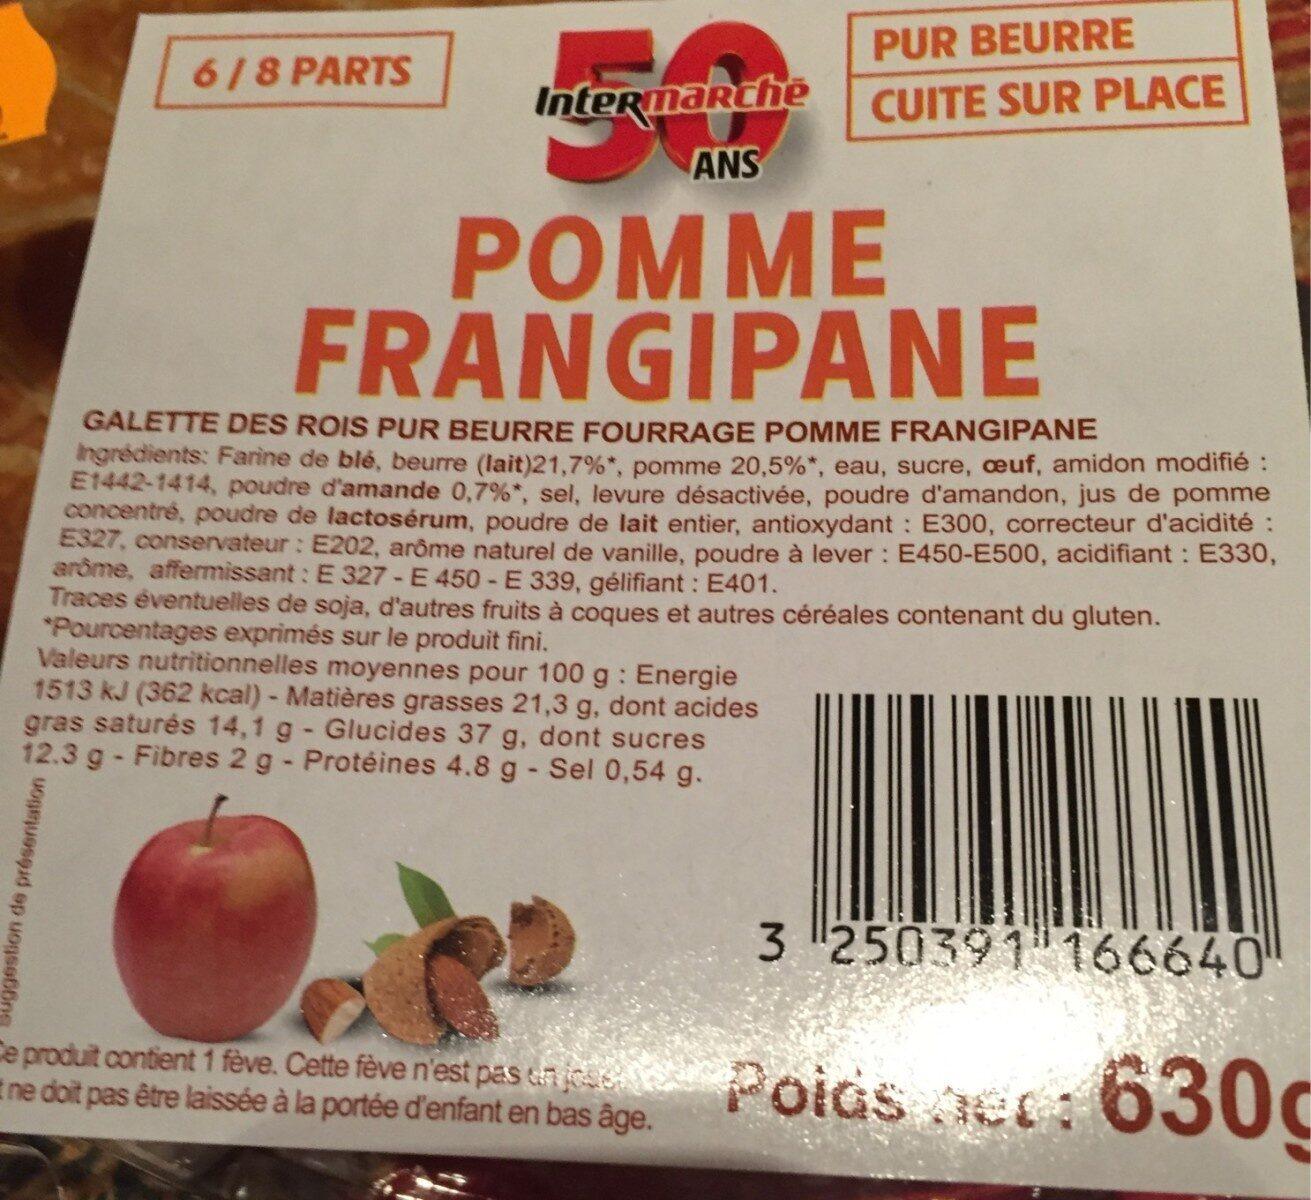 Galette des rois pomme frangipane - Nutrition facts - fr